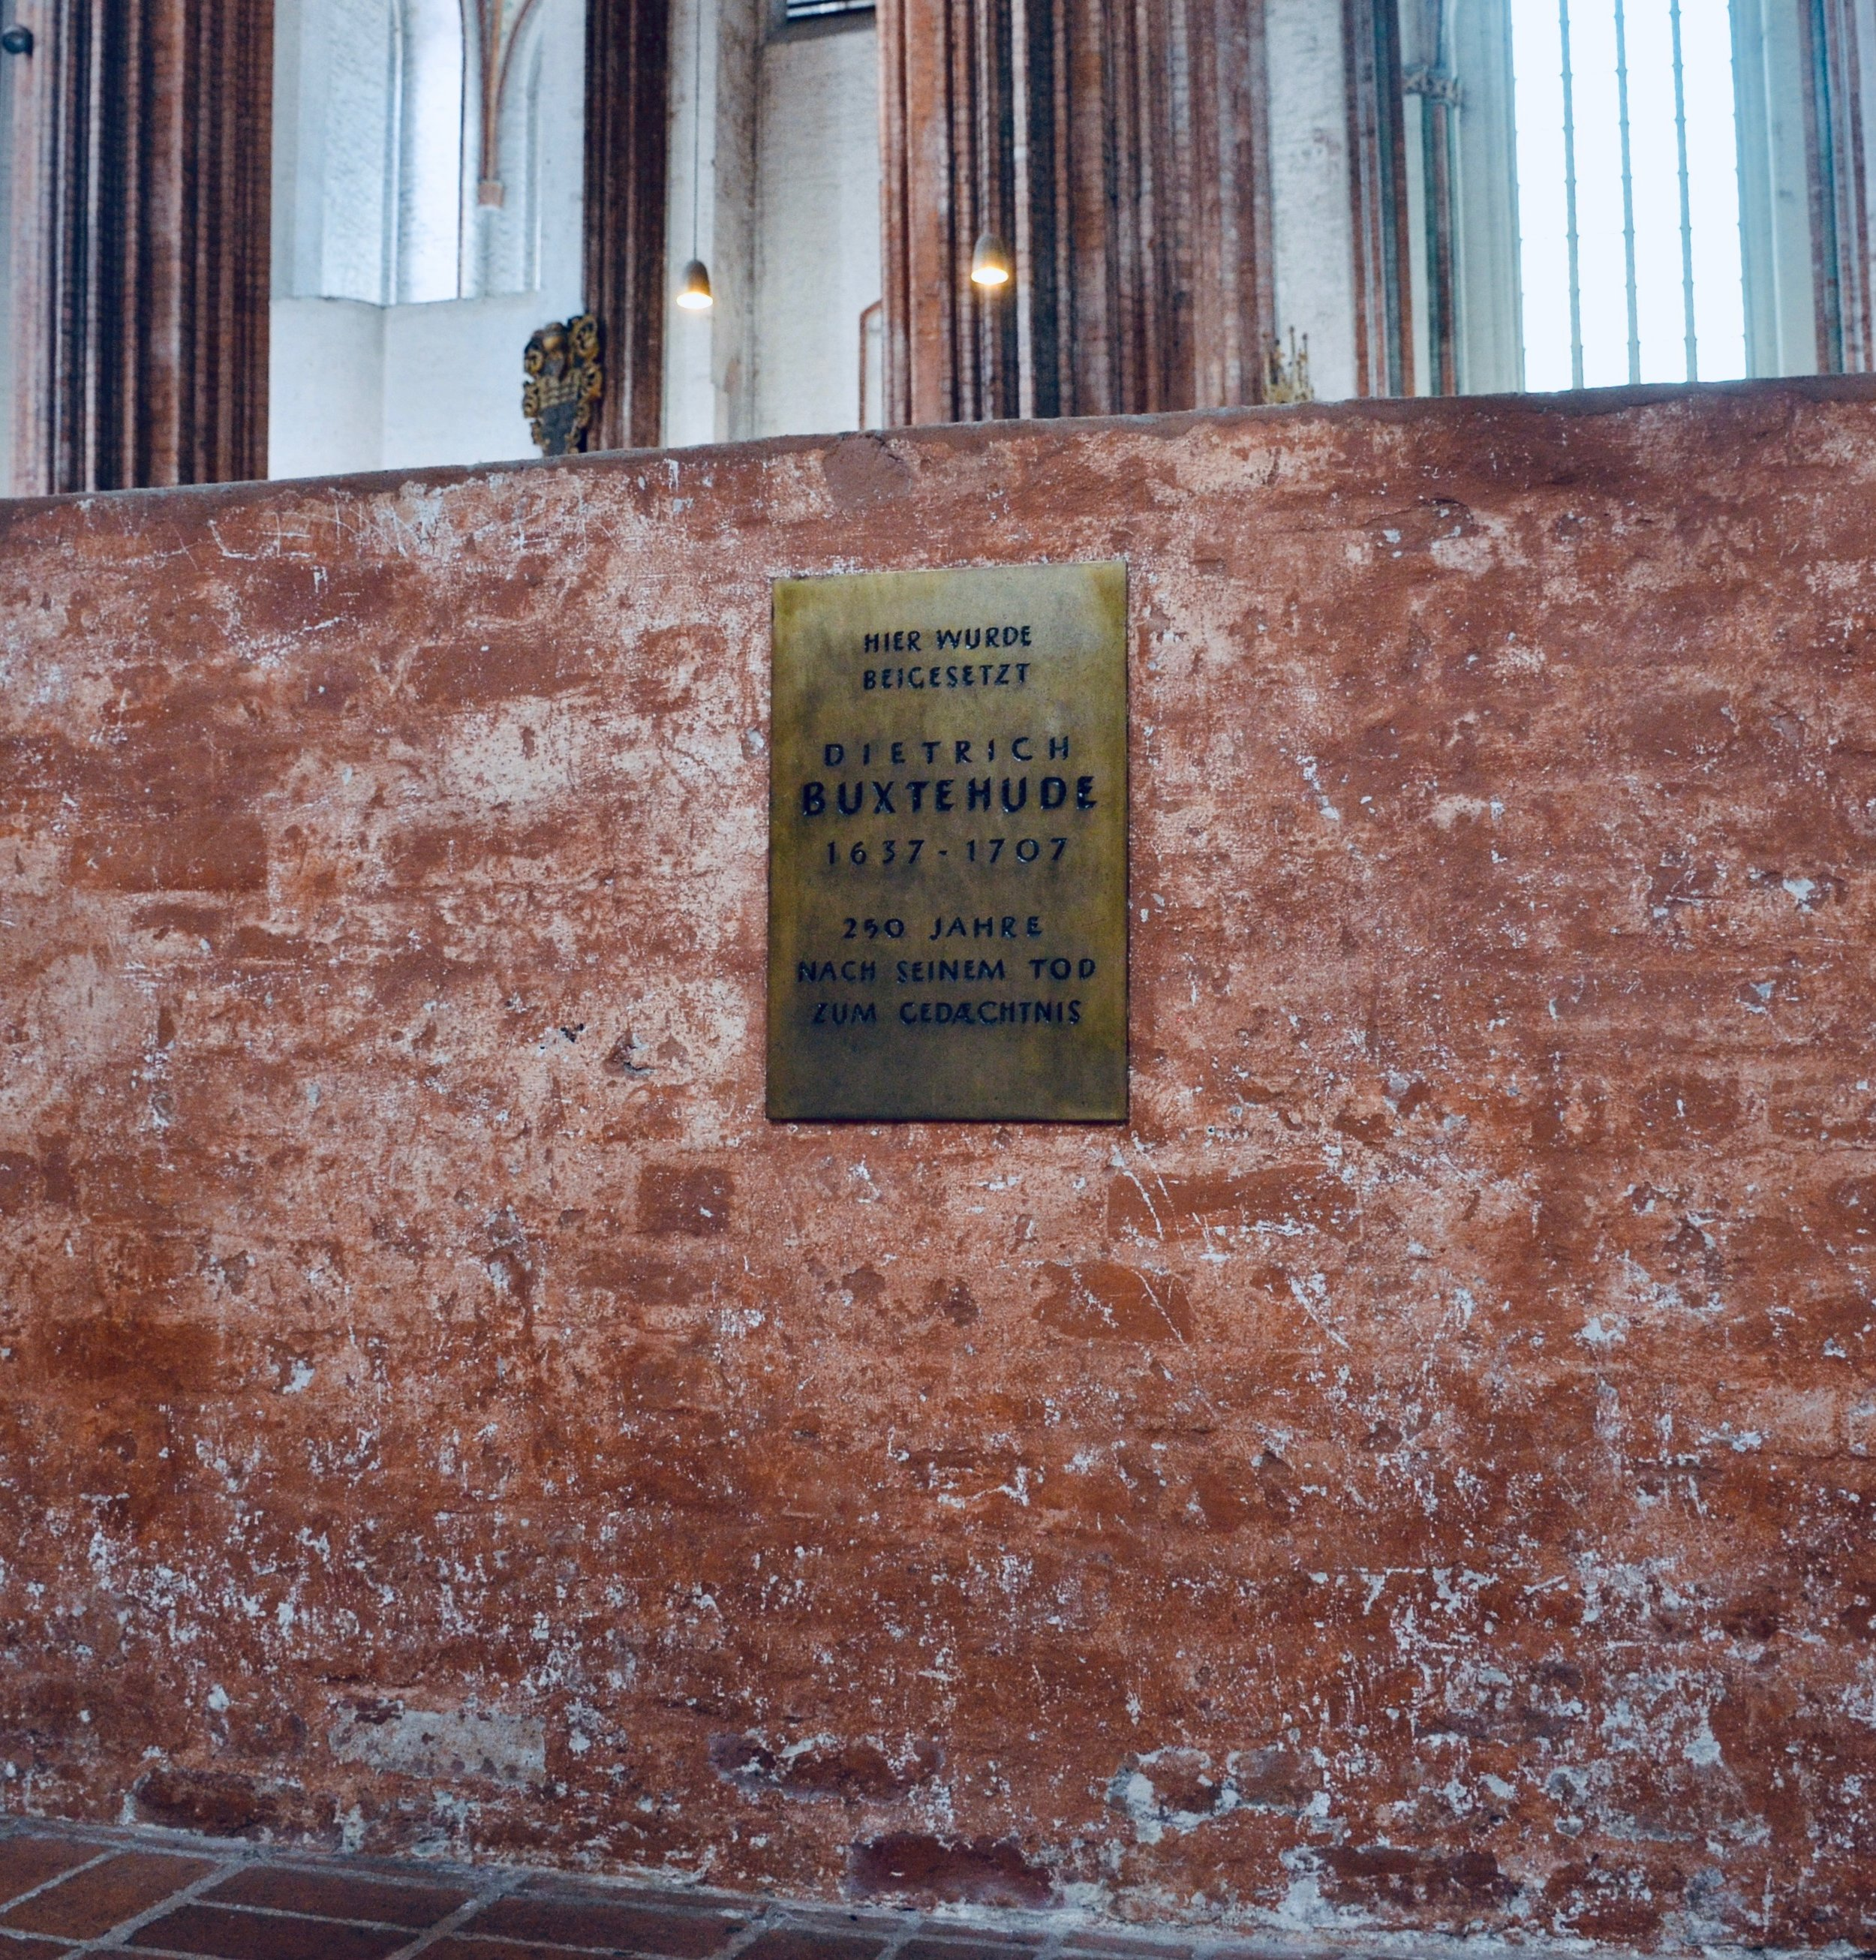 Buxtehude plaque, Marienkirche, Lübeck.